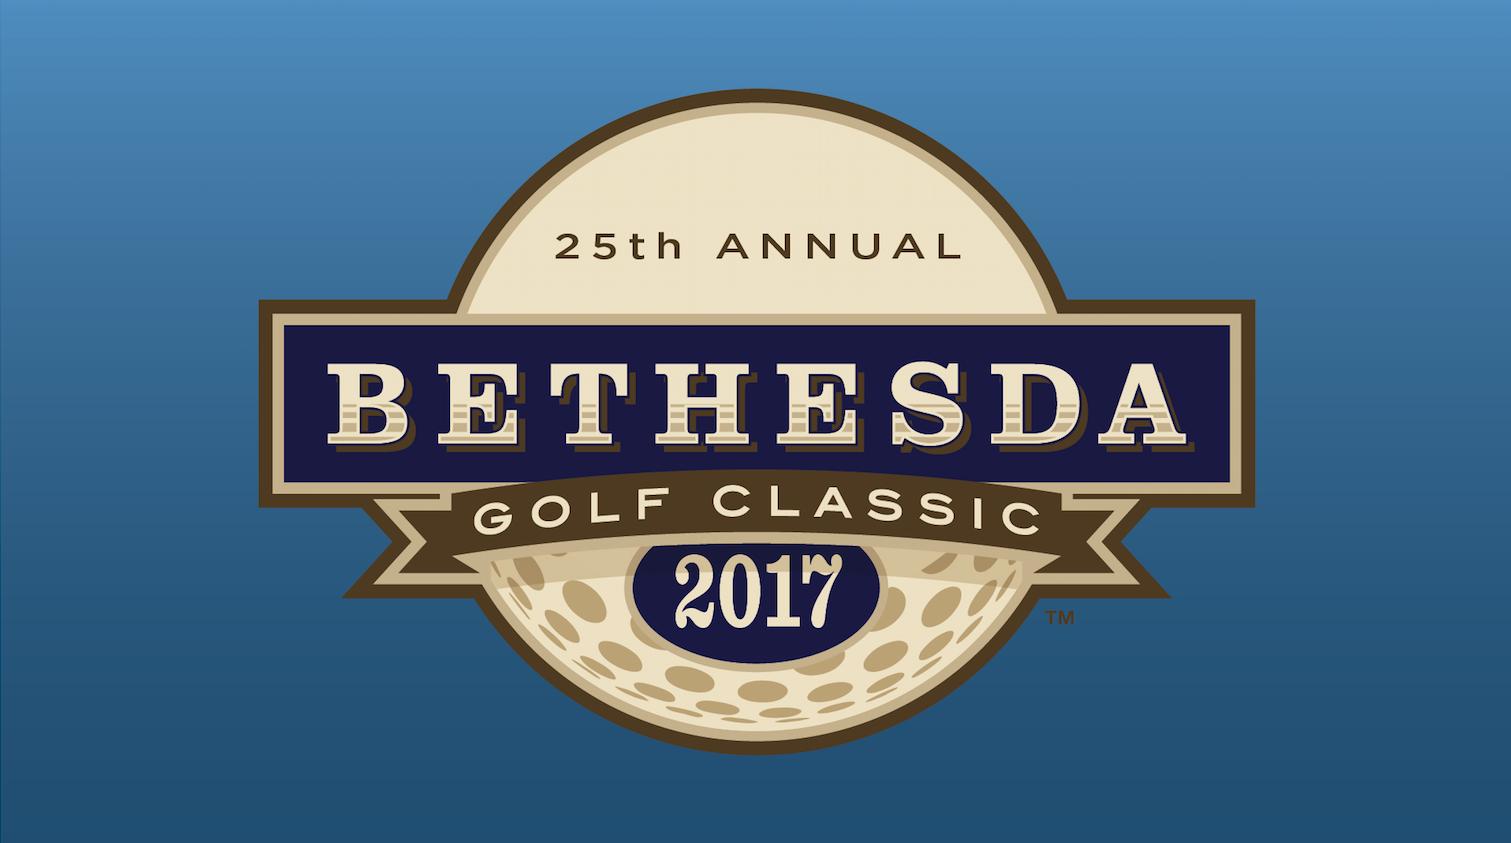 Bethesda Golf Classic logo